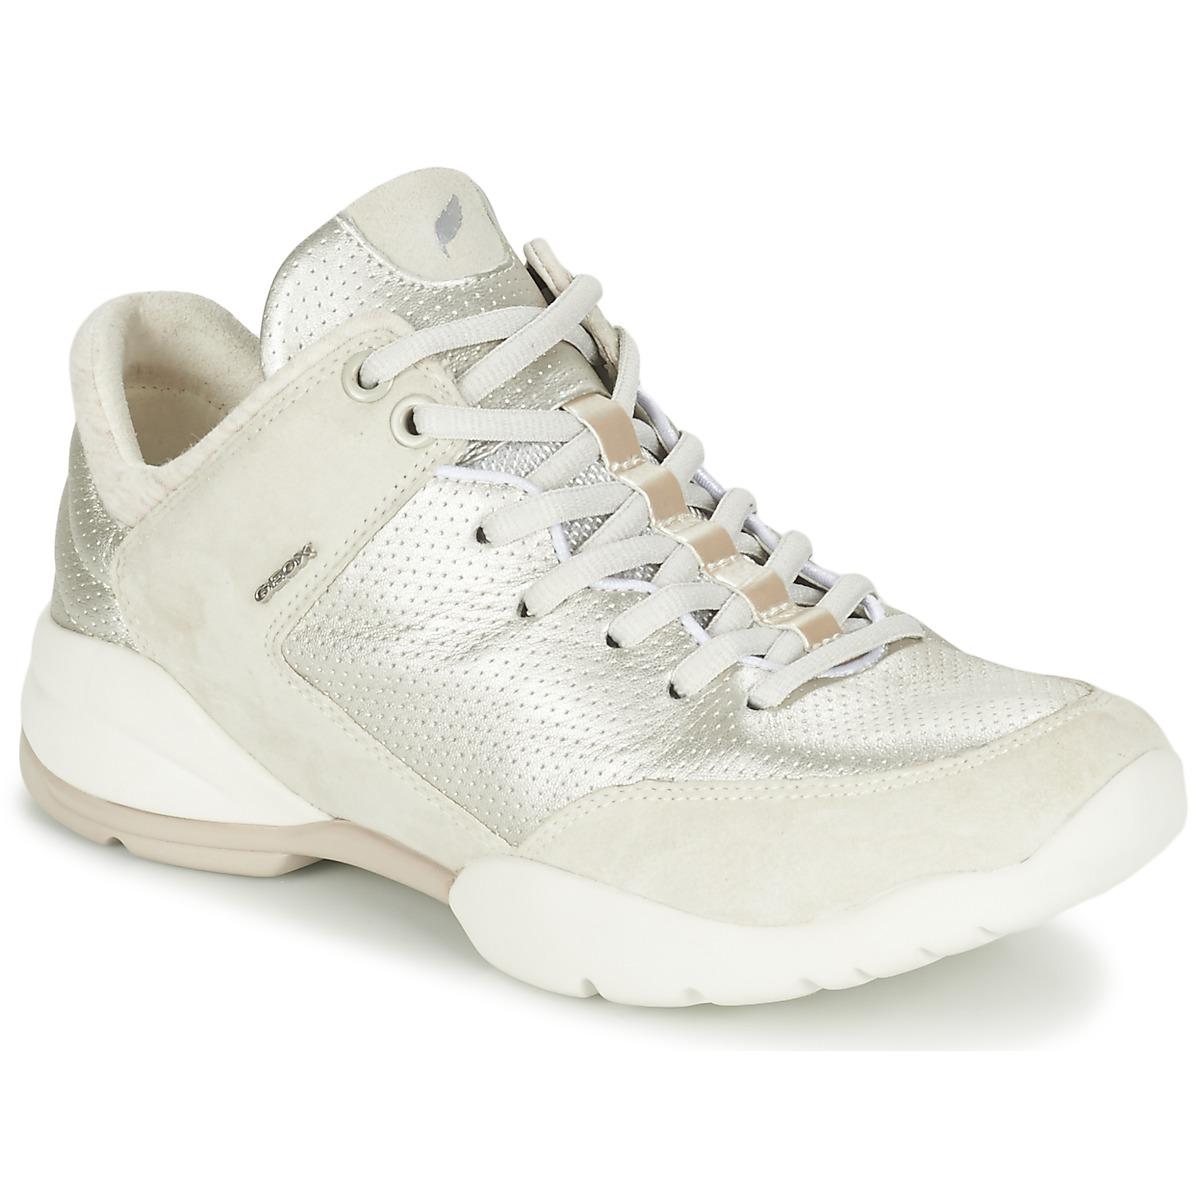 Geox SFINGE A Weiss - Kostenloser Versand bei Spartoode ! - Schuhe Sneaker Low Damen 97,30 €